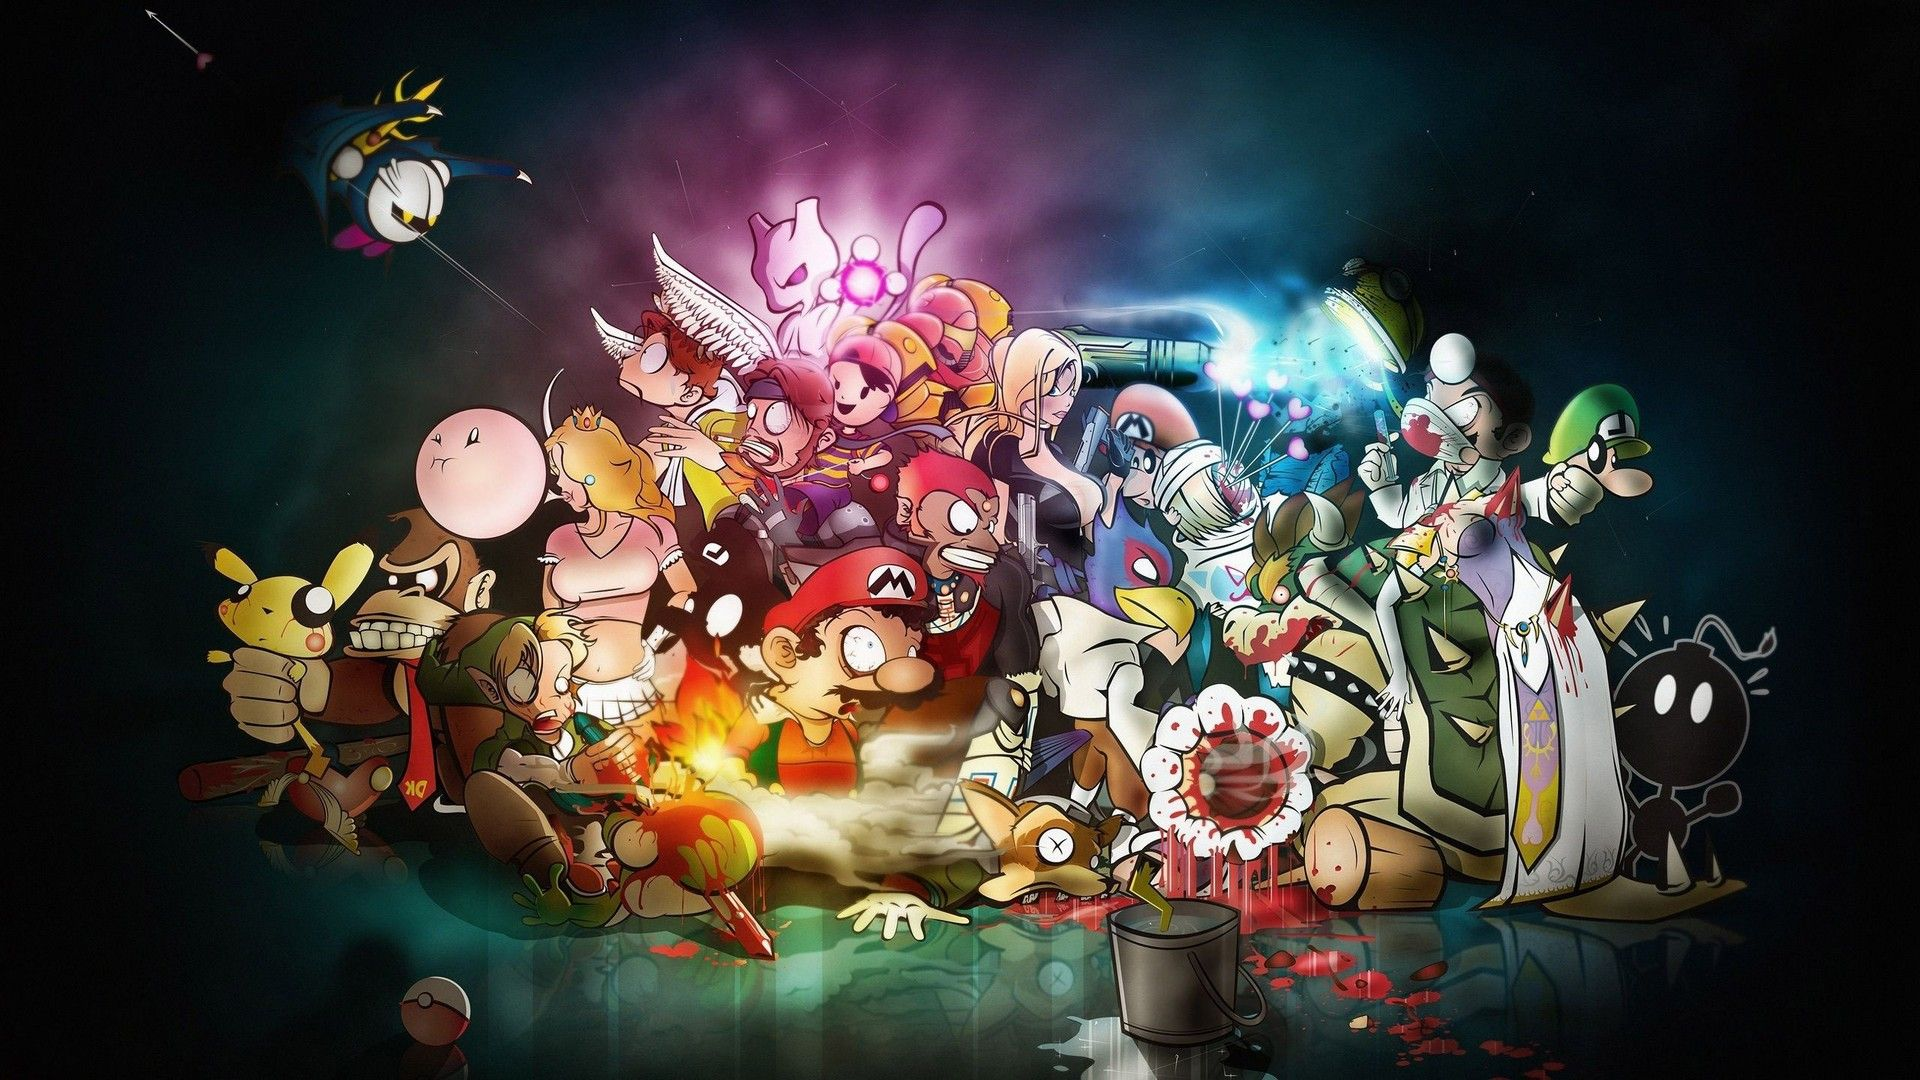 Video Game Wallpaper For Desktop Cartoon Wallpaper Disney